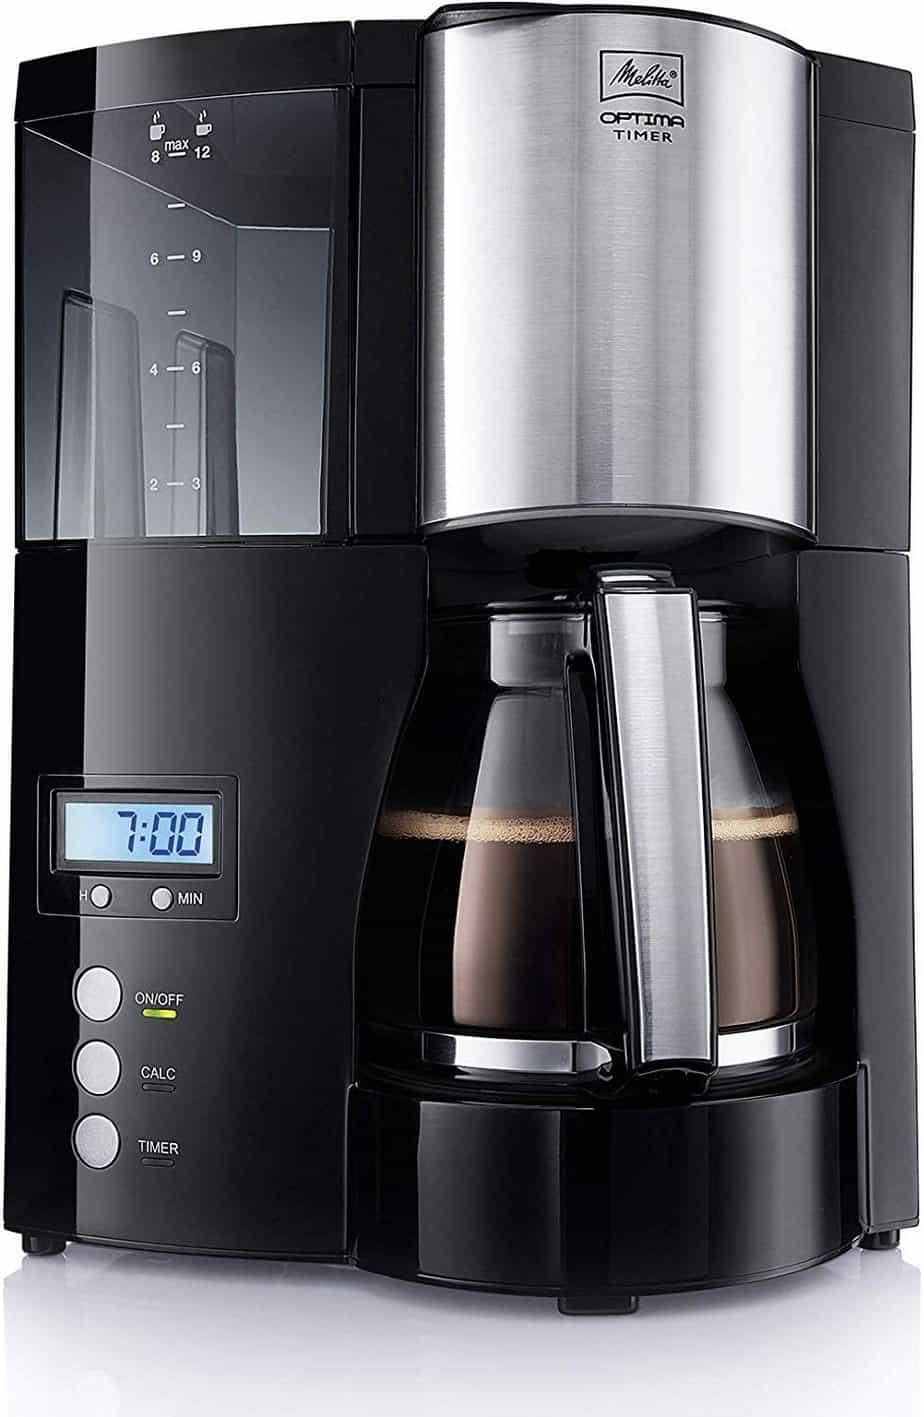 Melitta Optima Timer Filterkaffeemaschine